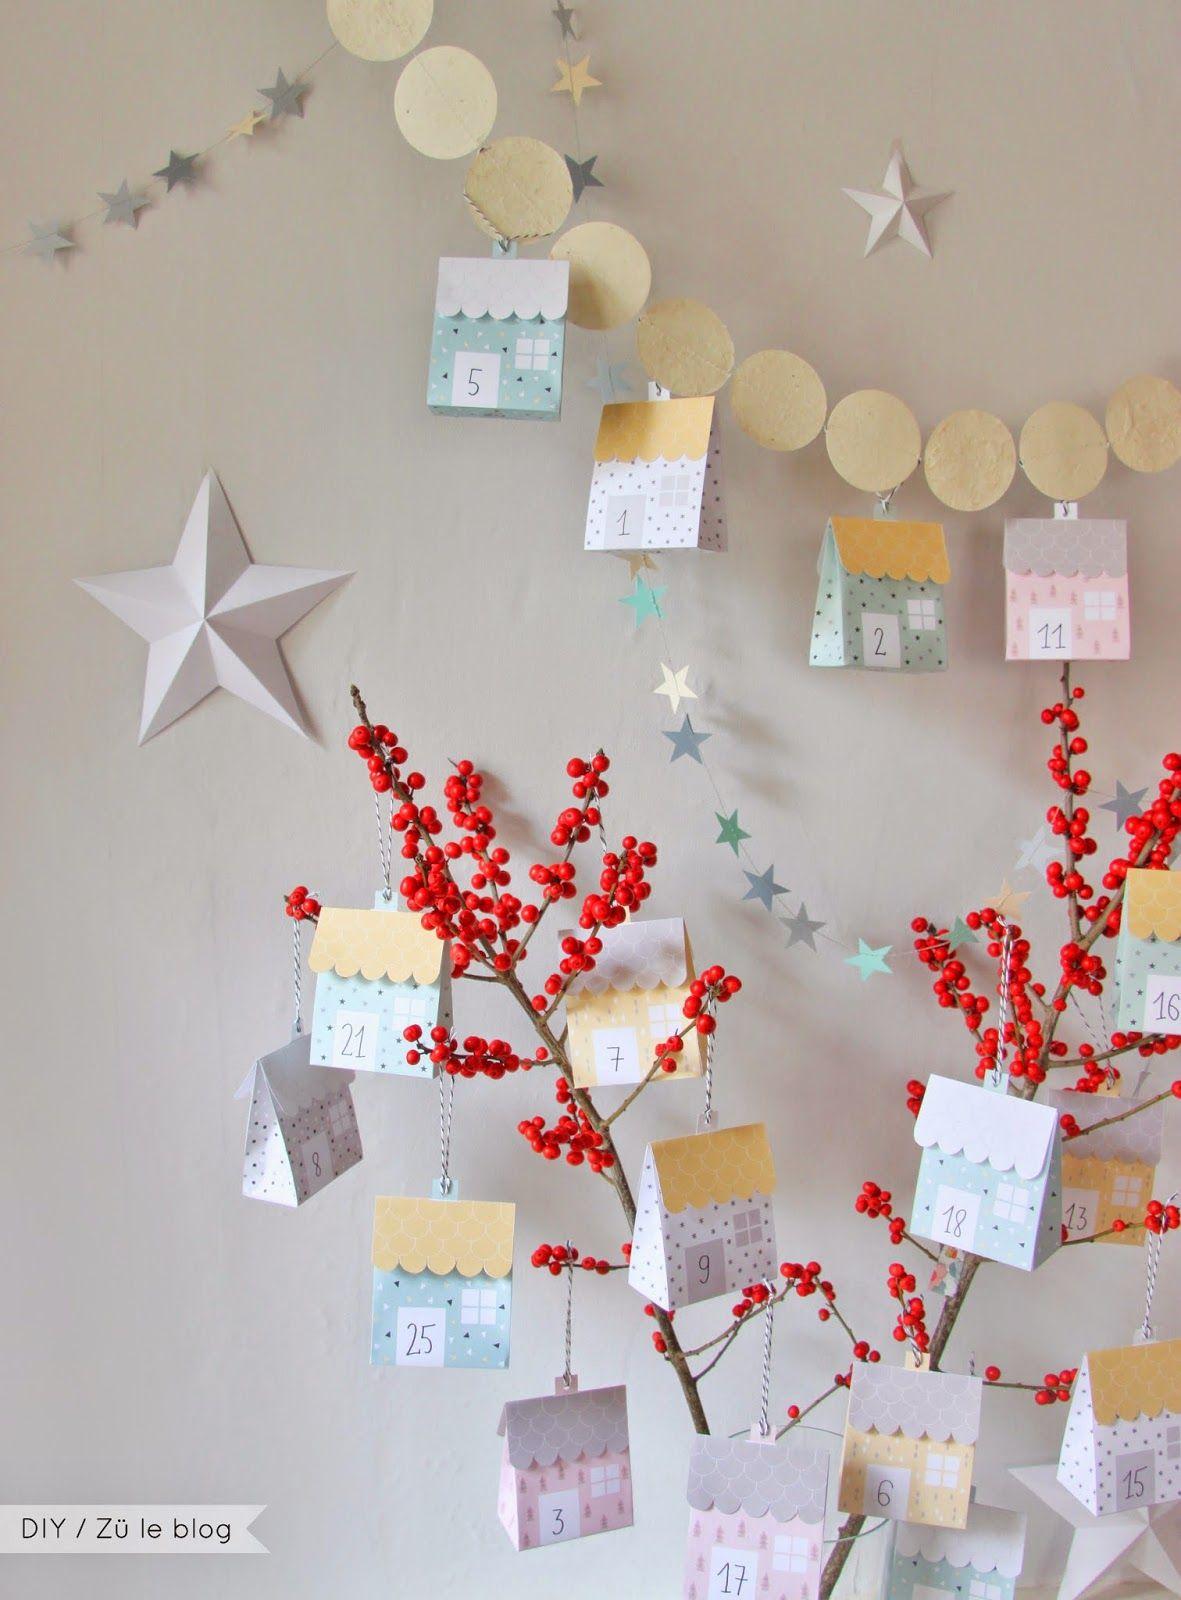 zü: Calendrier de l'Avent DIY / Le village - Frei Adventskalender zum drücken - Advent Calendar free printable